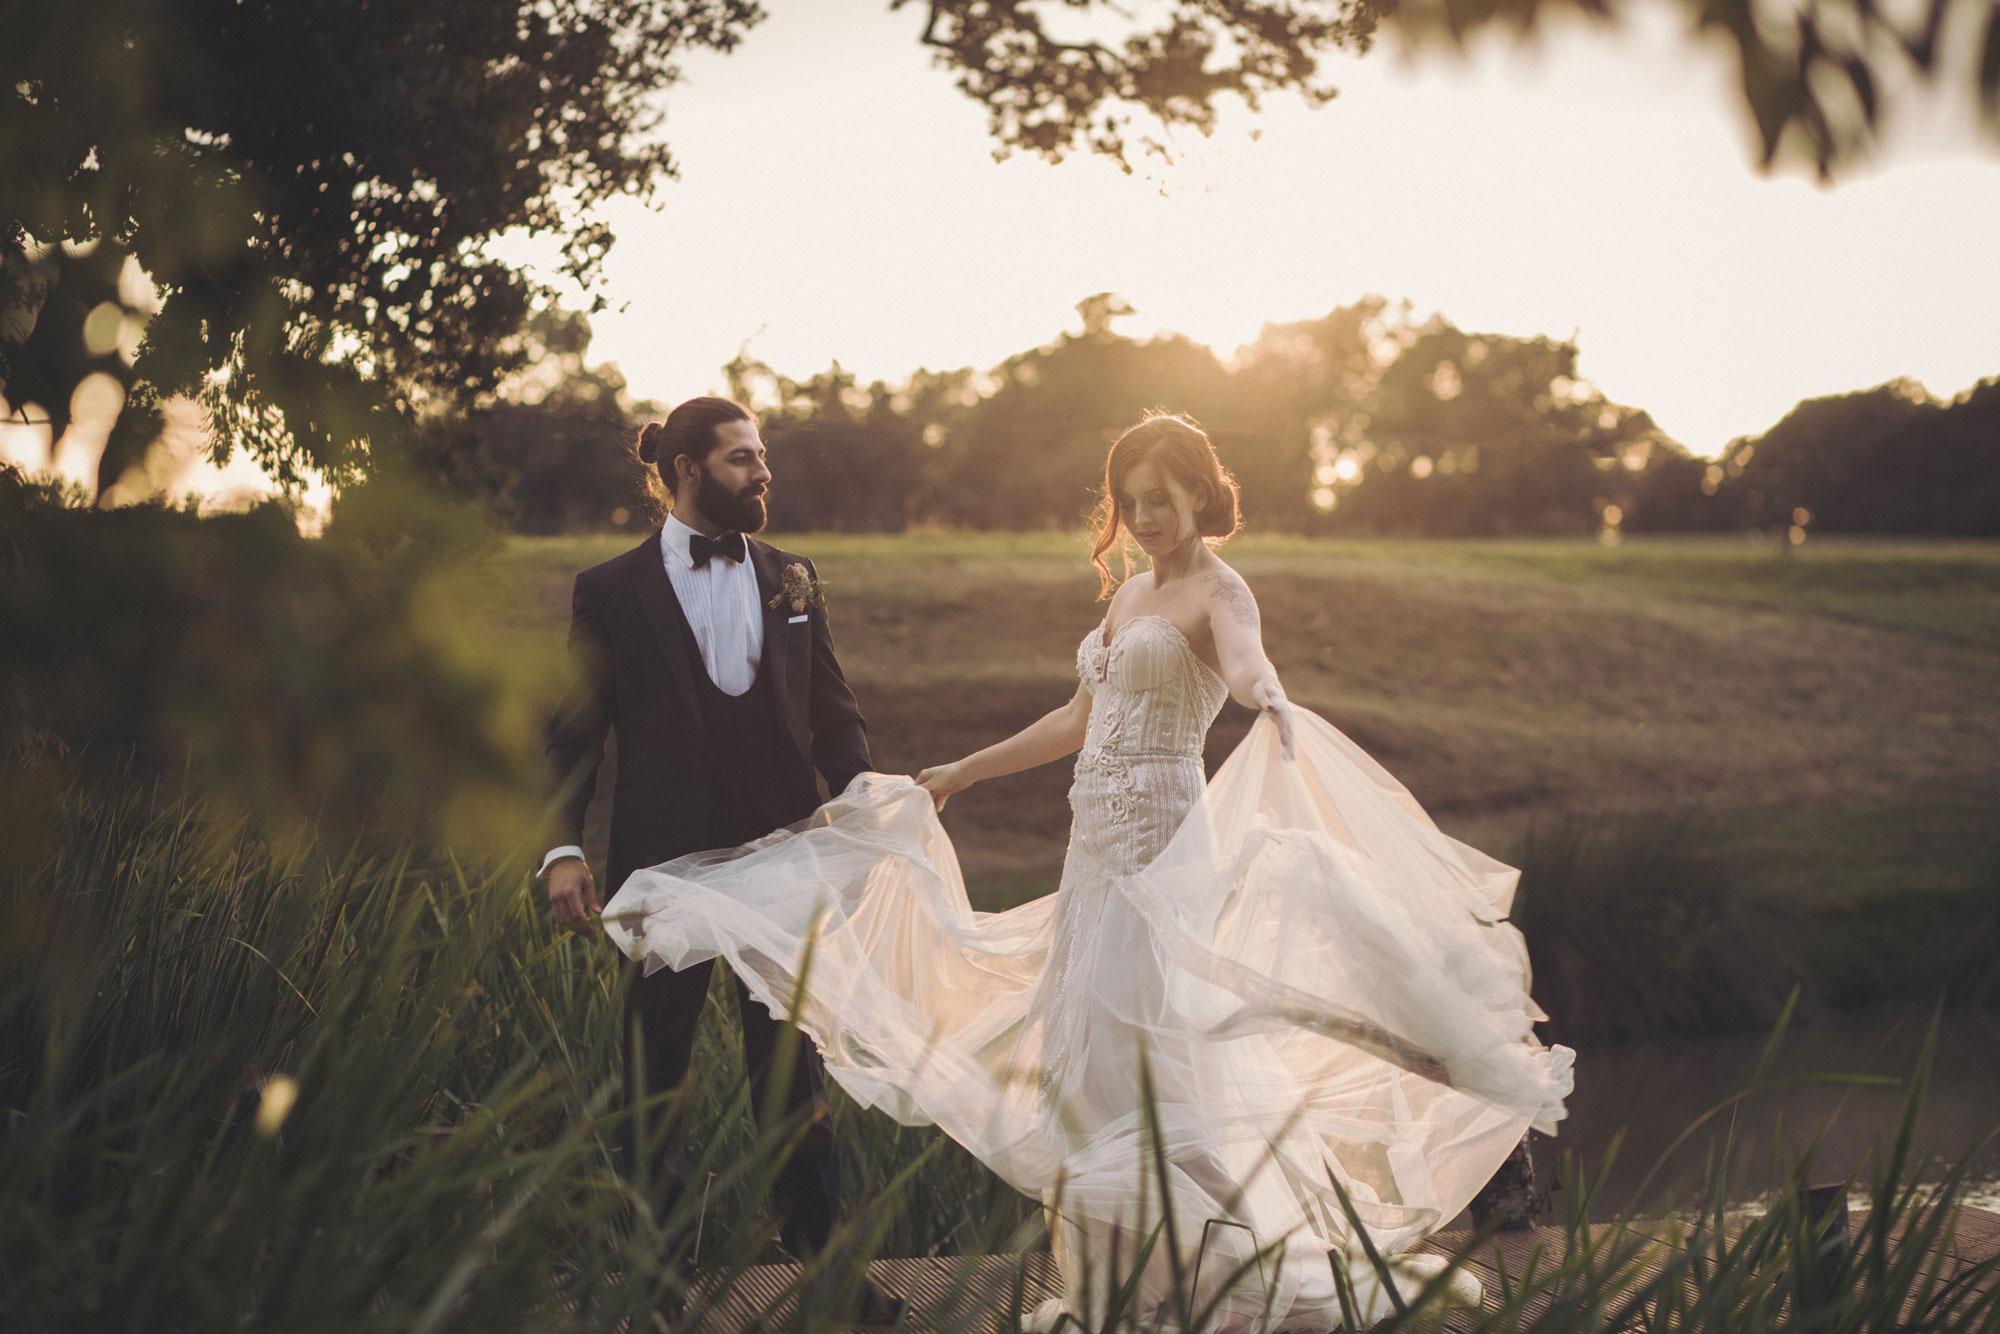 light airy wedding photographer kent